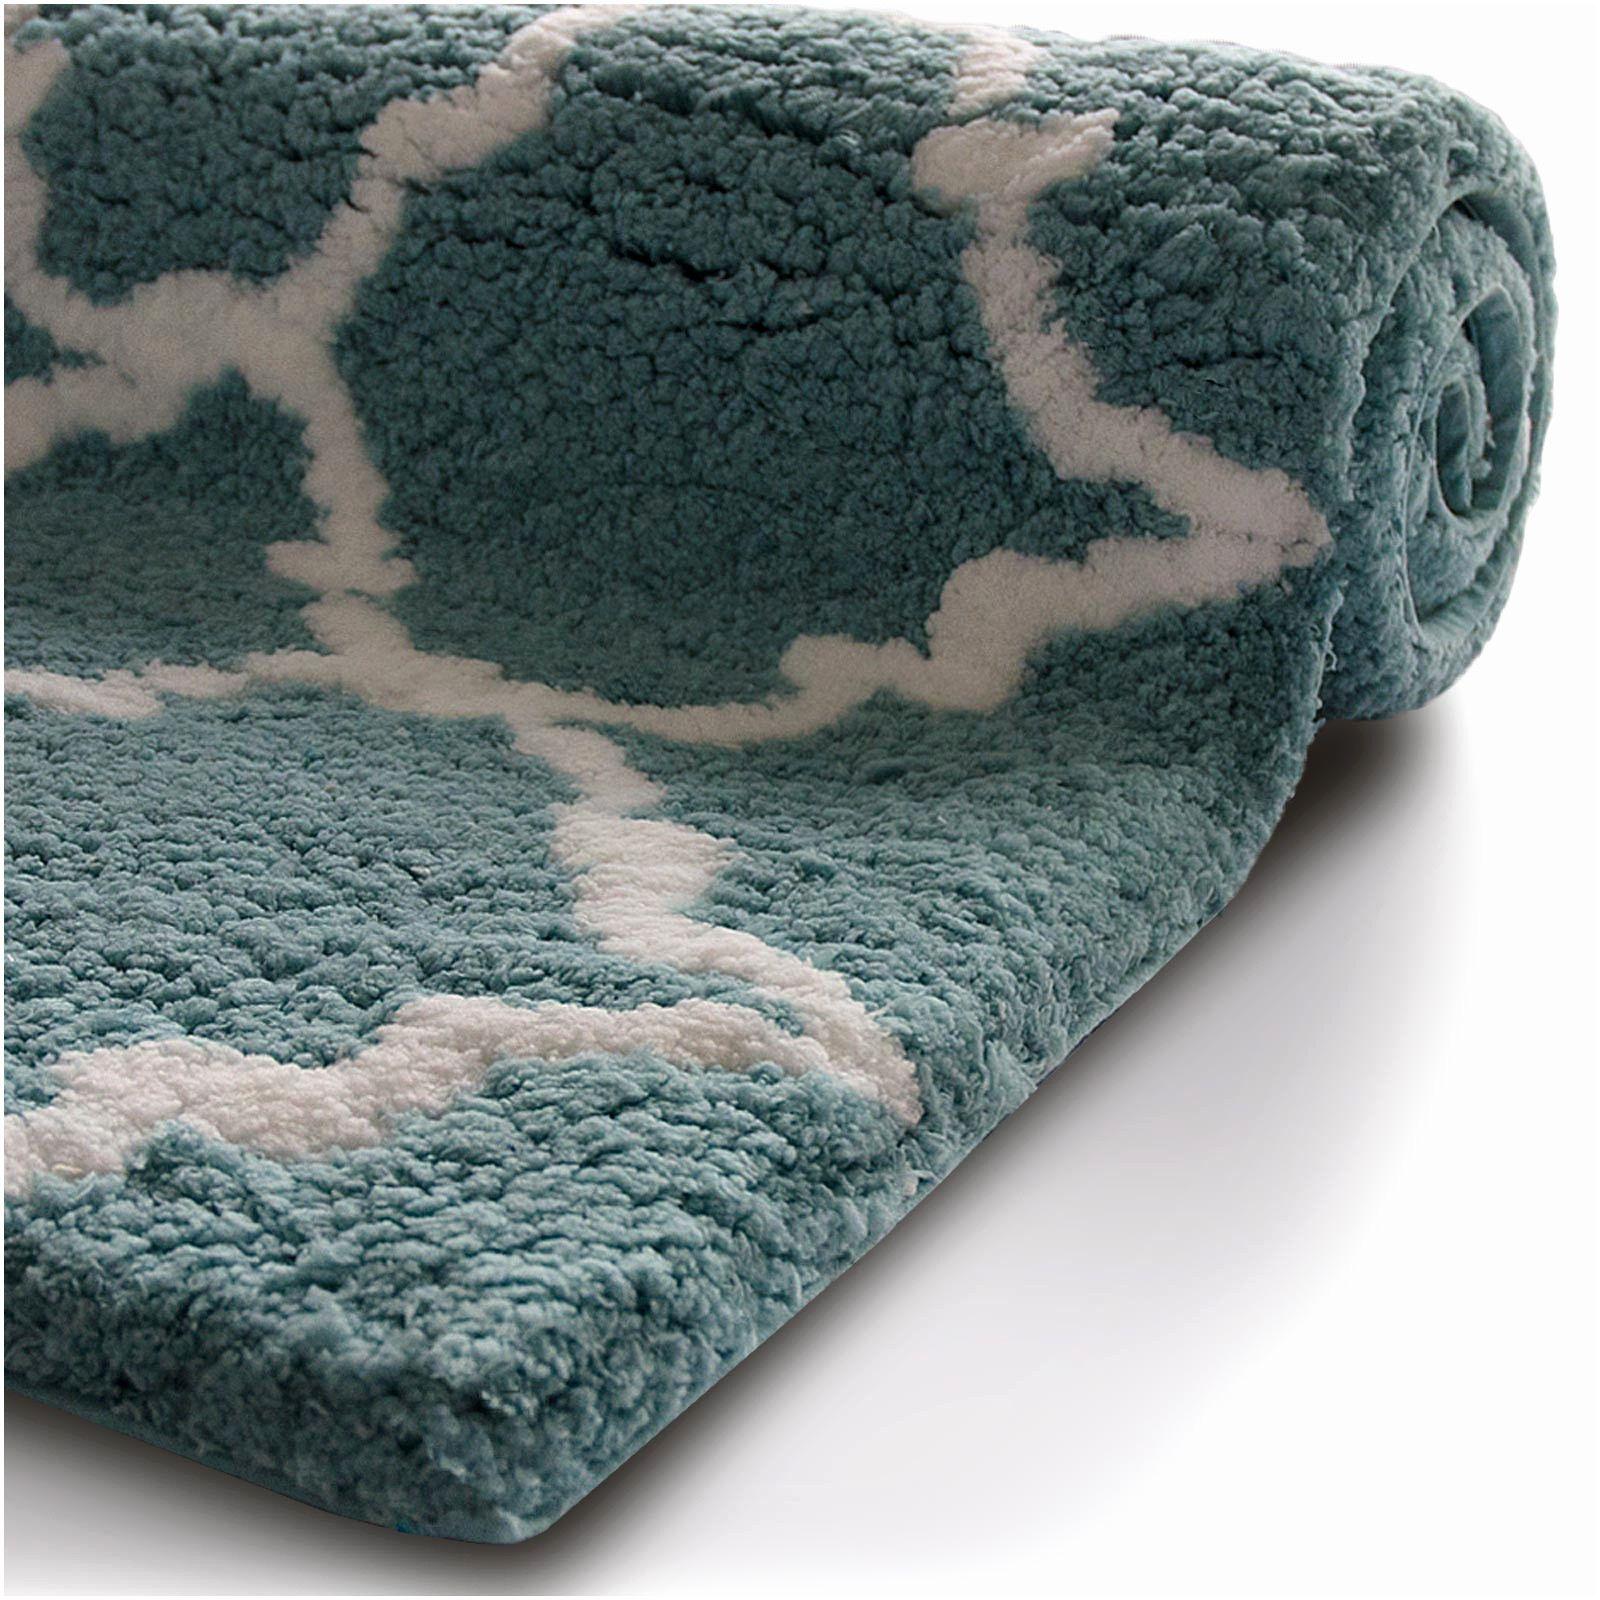 Best Of Tapis De Bain Grande Taille Home Decor Decor Towel